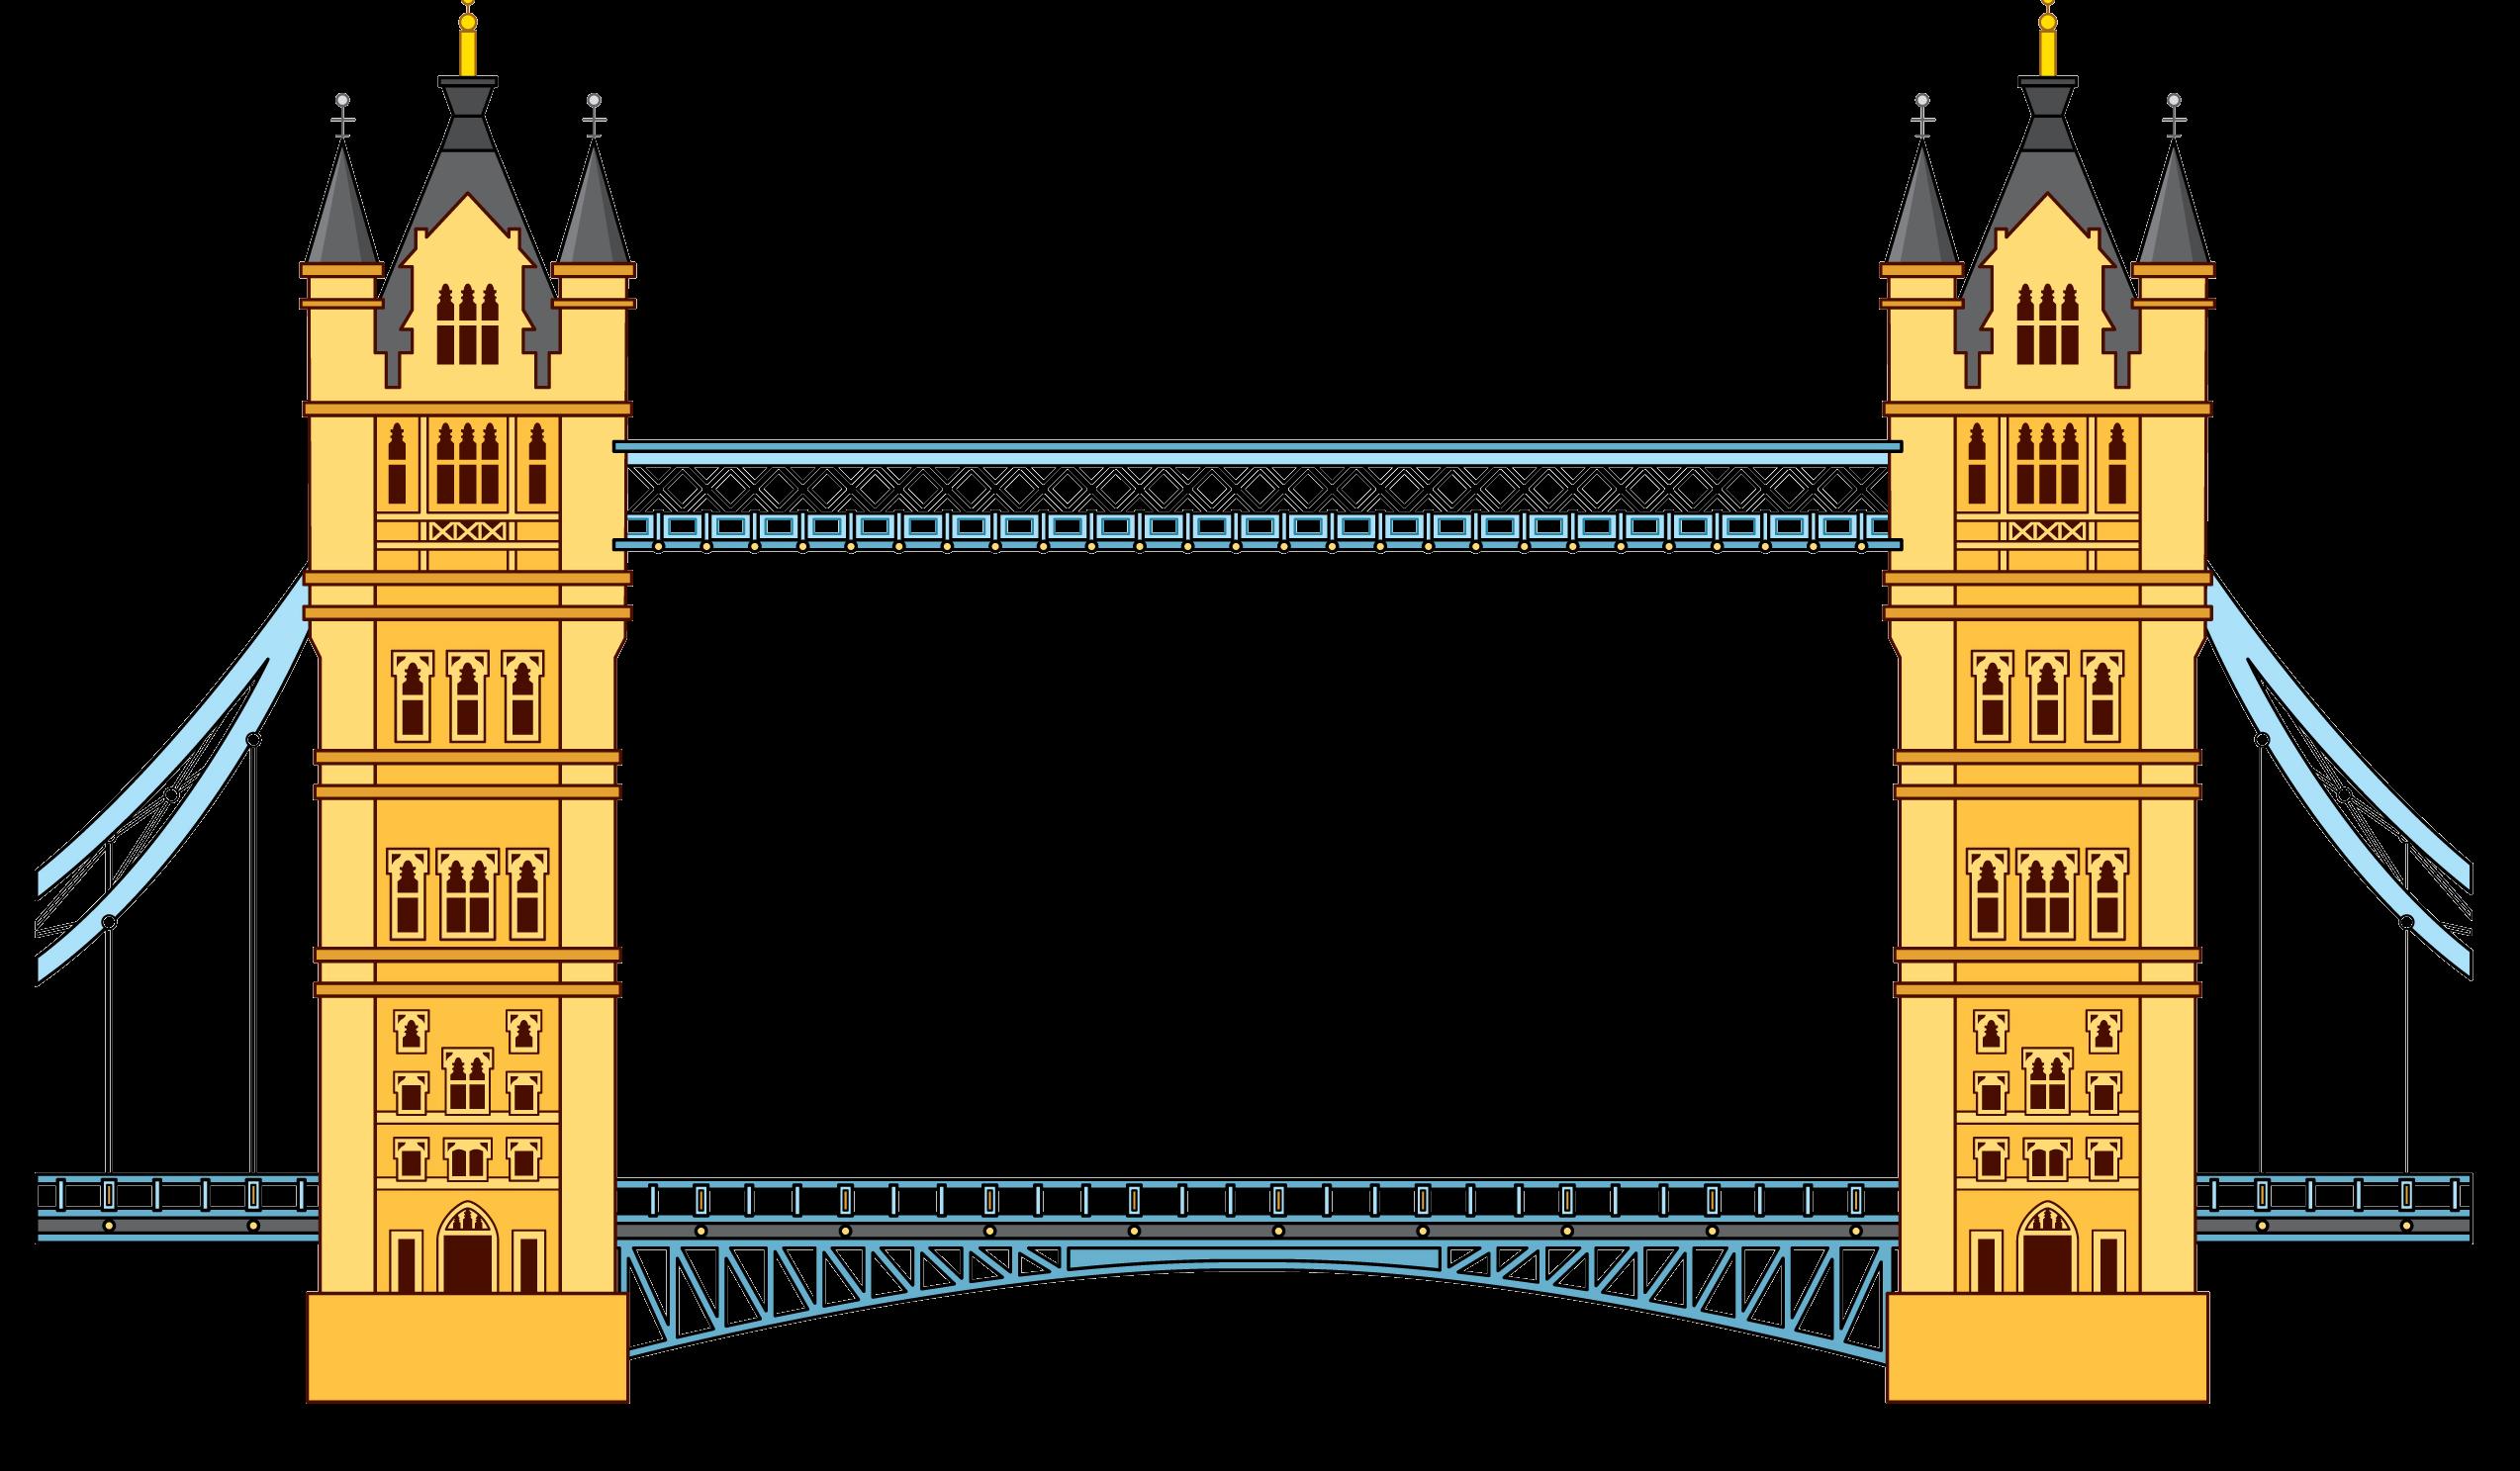 London clipart london bridge.  collection of simple